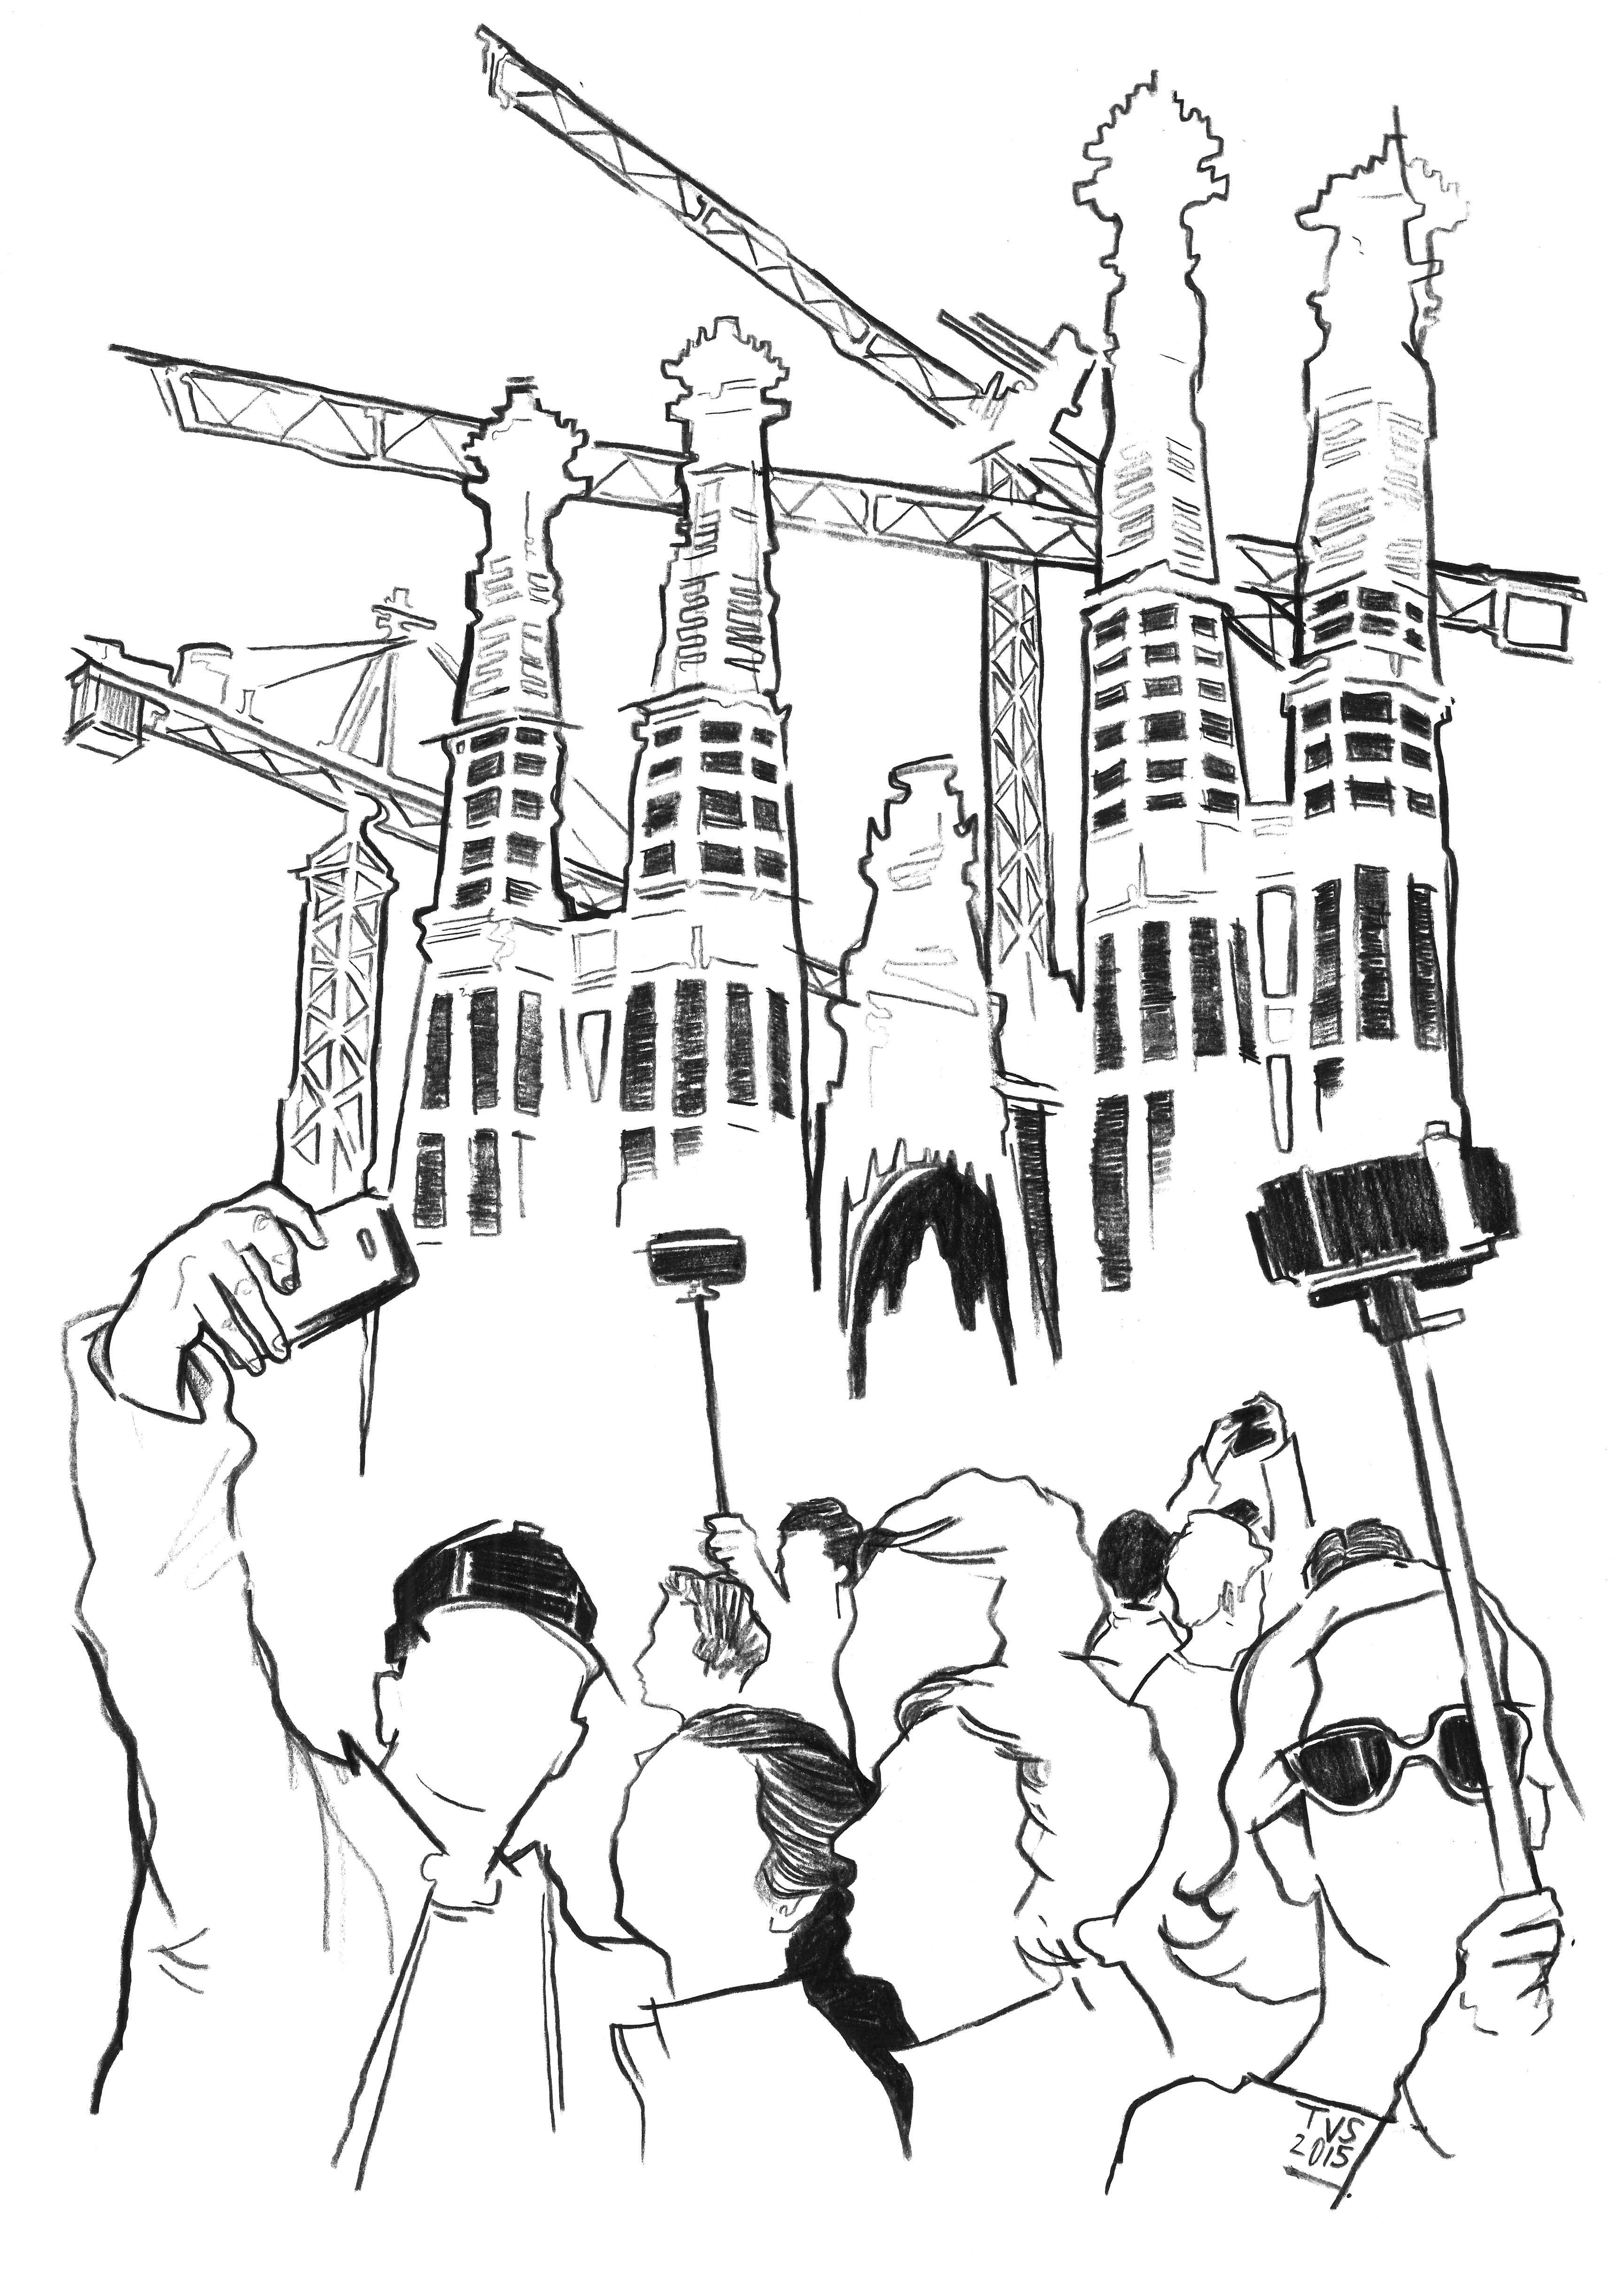 barcelona drawing at getdrawings com